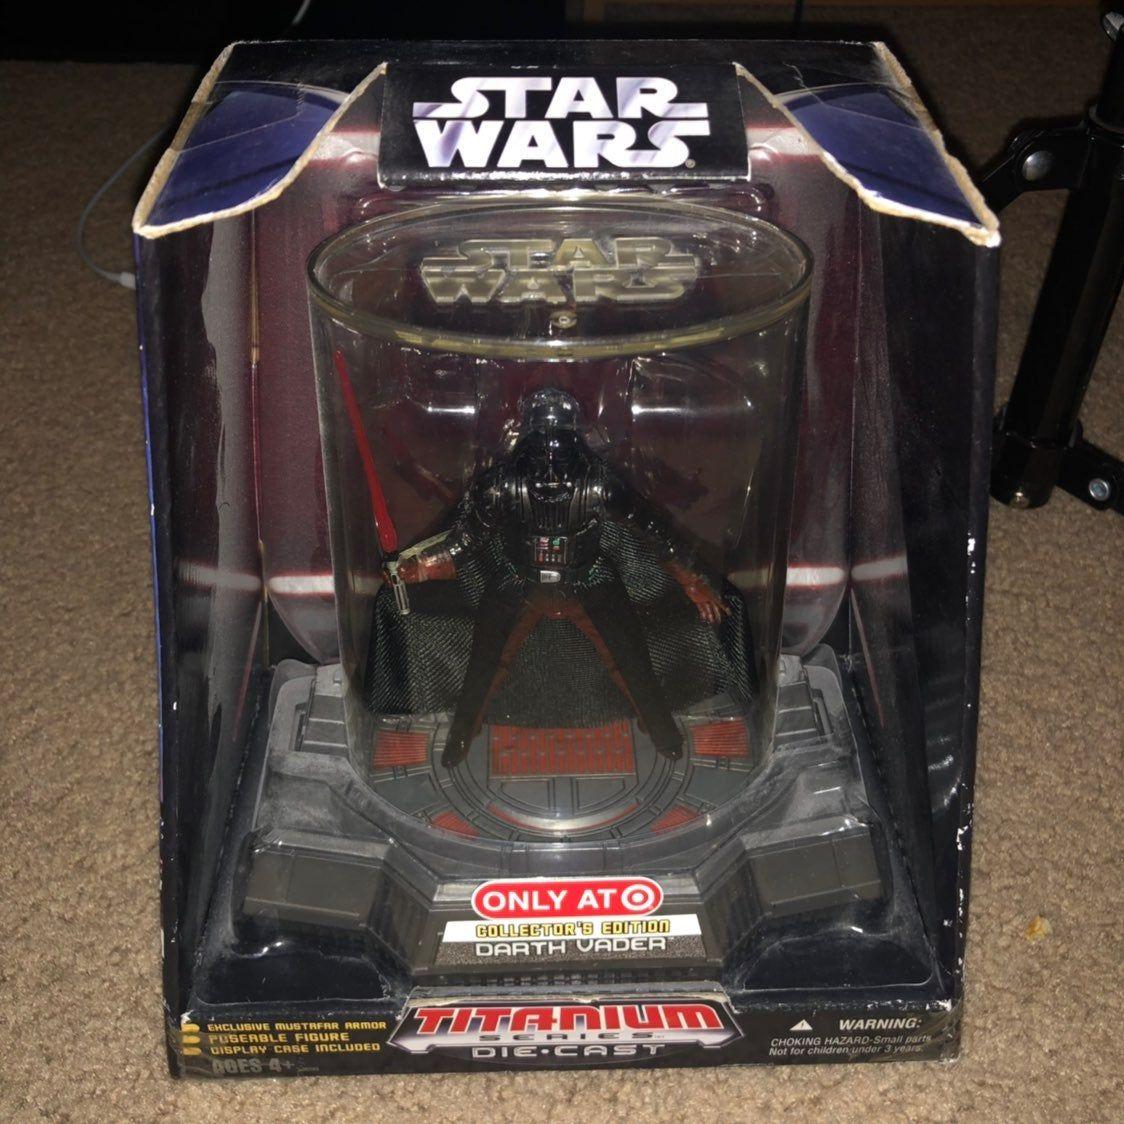 Star Wars Titanium Series 2006 édition Collector Darth Vadar TARGET EXCLUSIVE